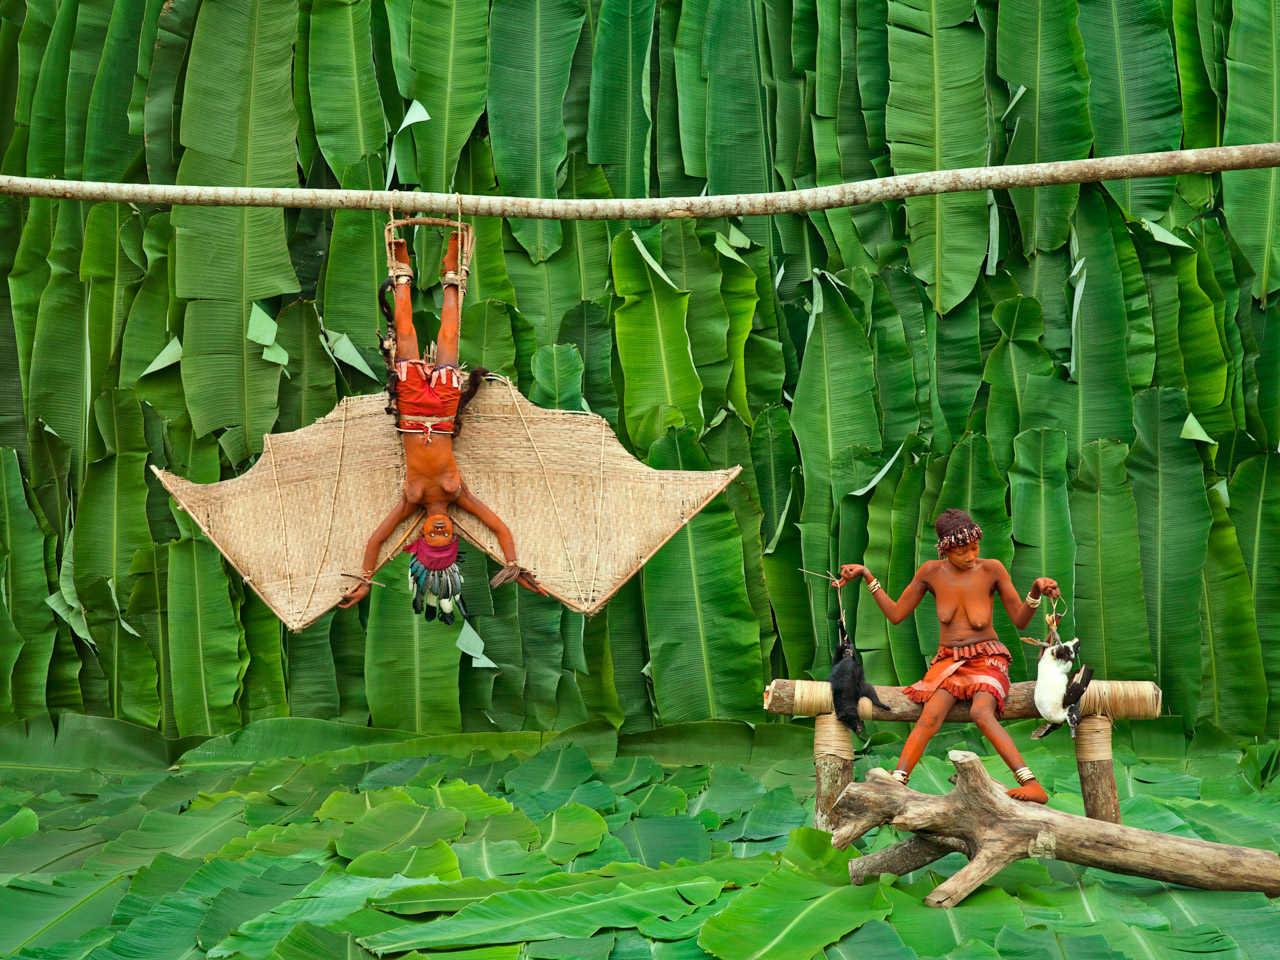 Epanza Makita, Bat Walé